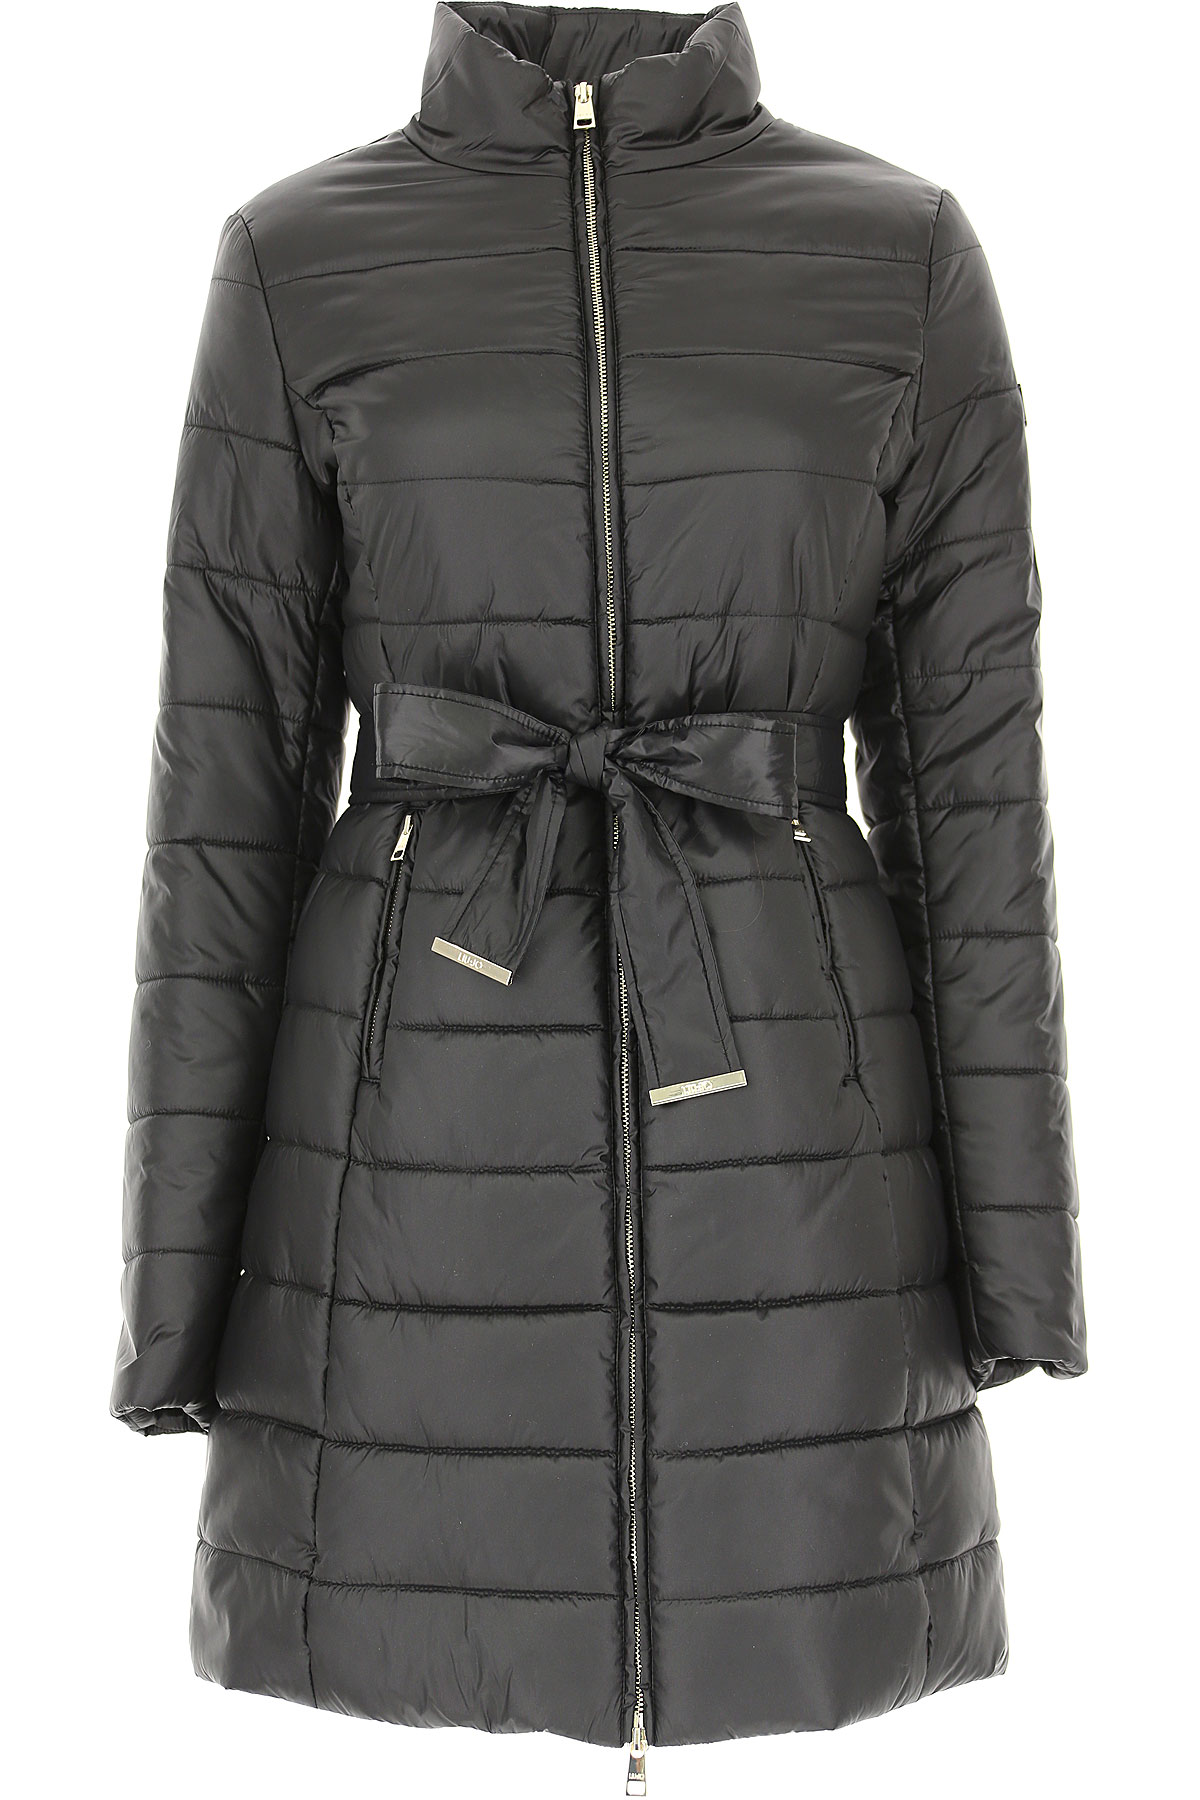 Image of Liu Jo Down Jacket for Women, Puffer Ski Jacket, Black, polyester, 2017, 10 4 6 8